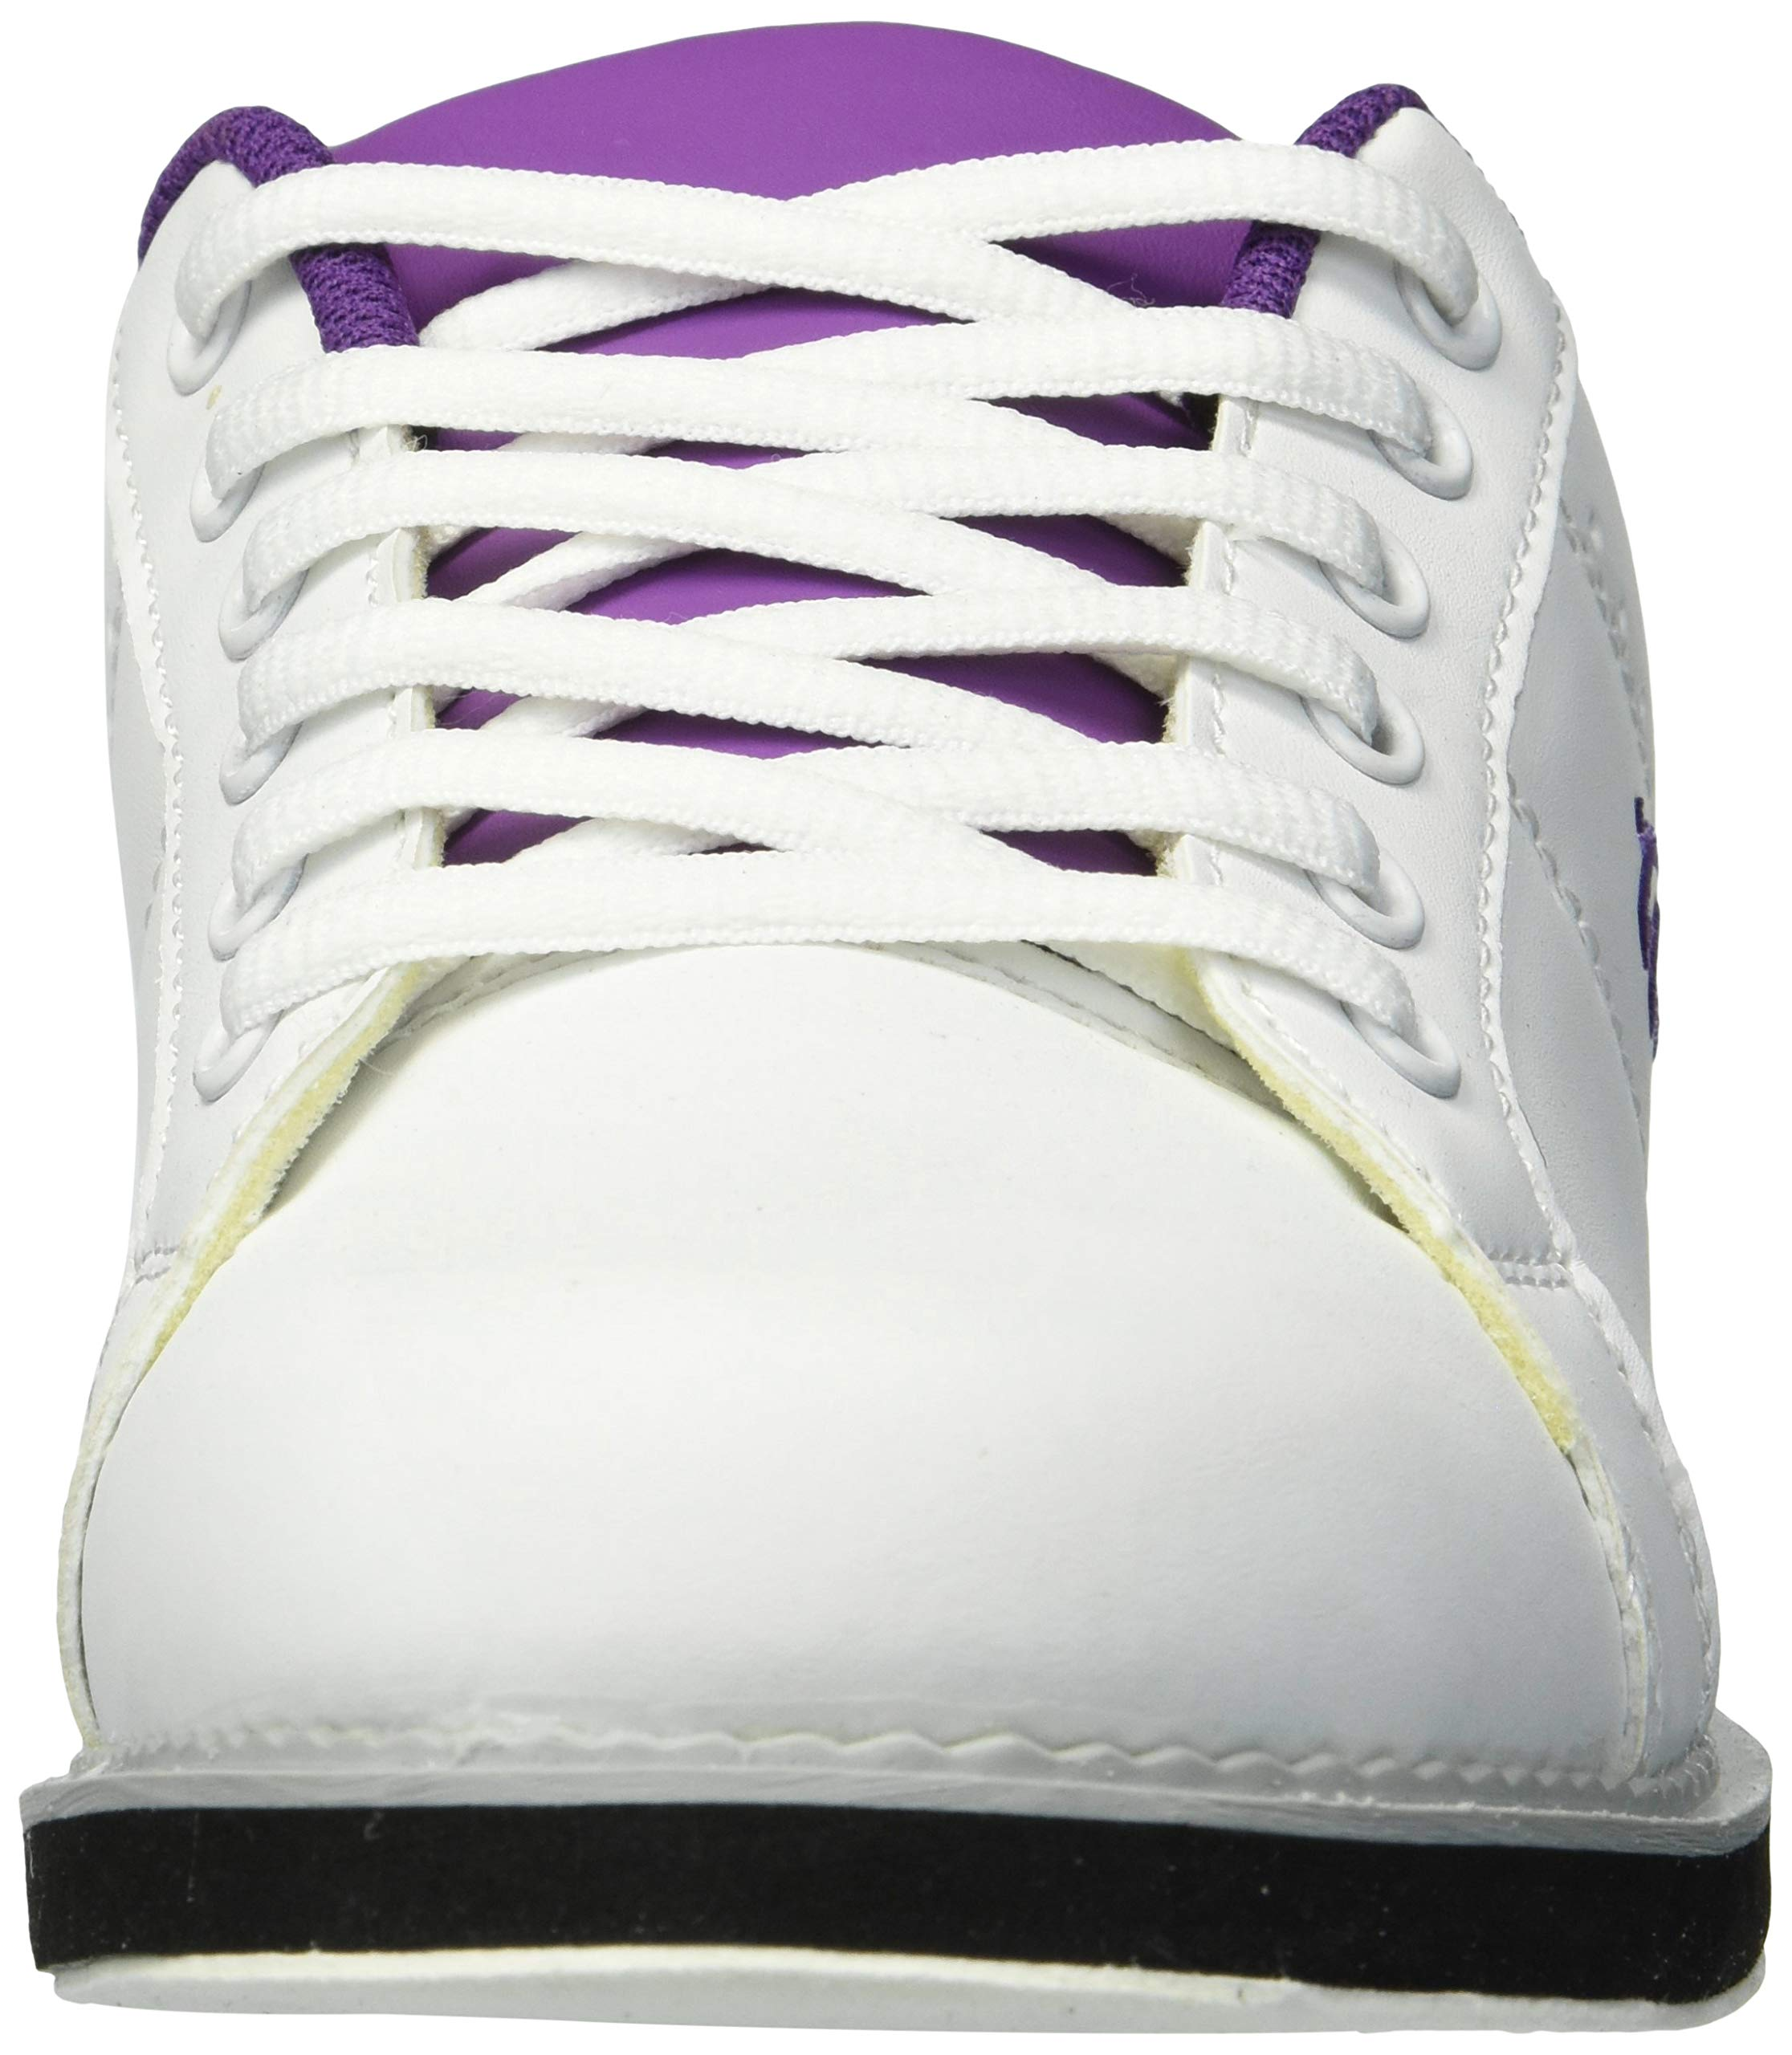 BSI Women's 460 Bowling Shoe, White/Purple, Size 10 by BSI (Image #4)